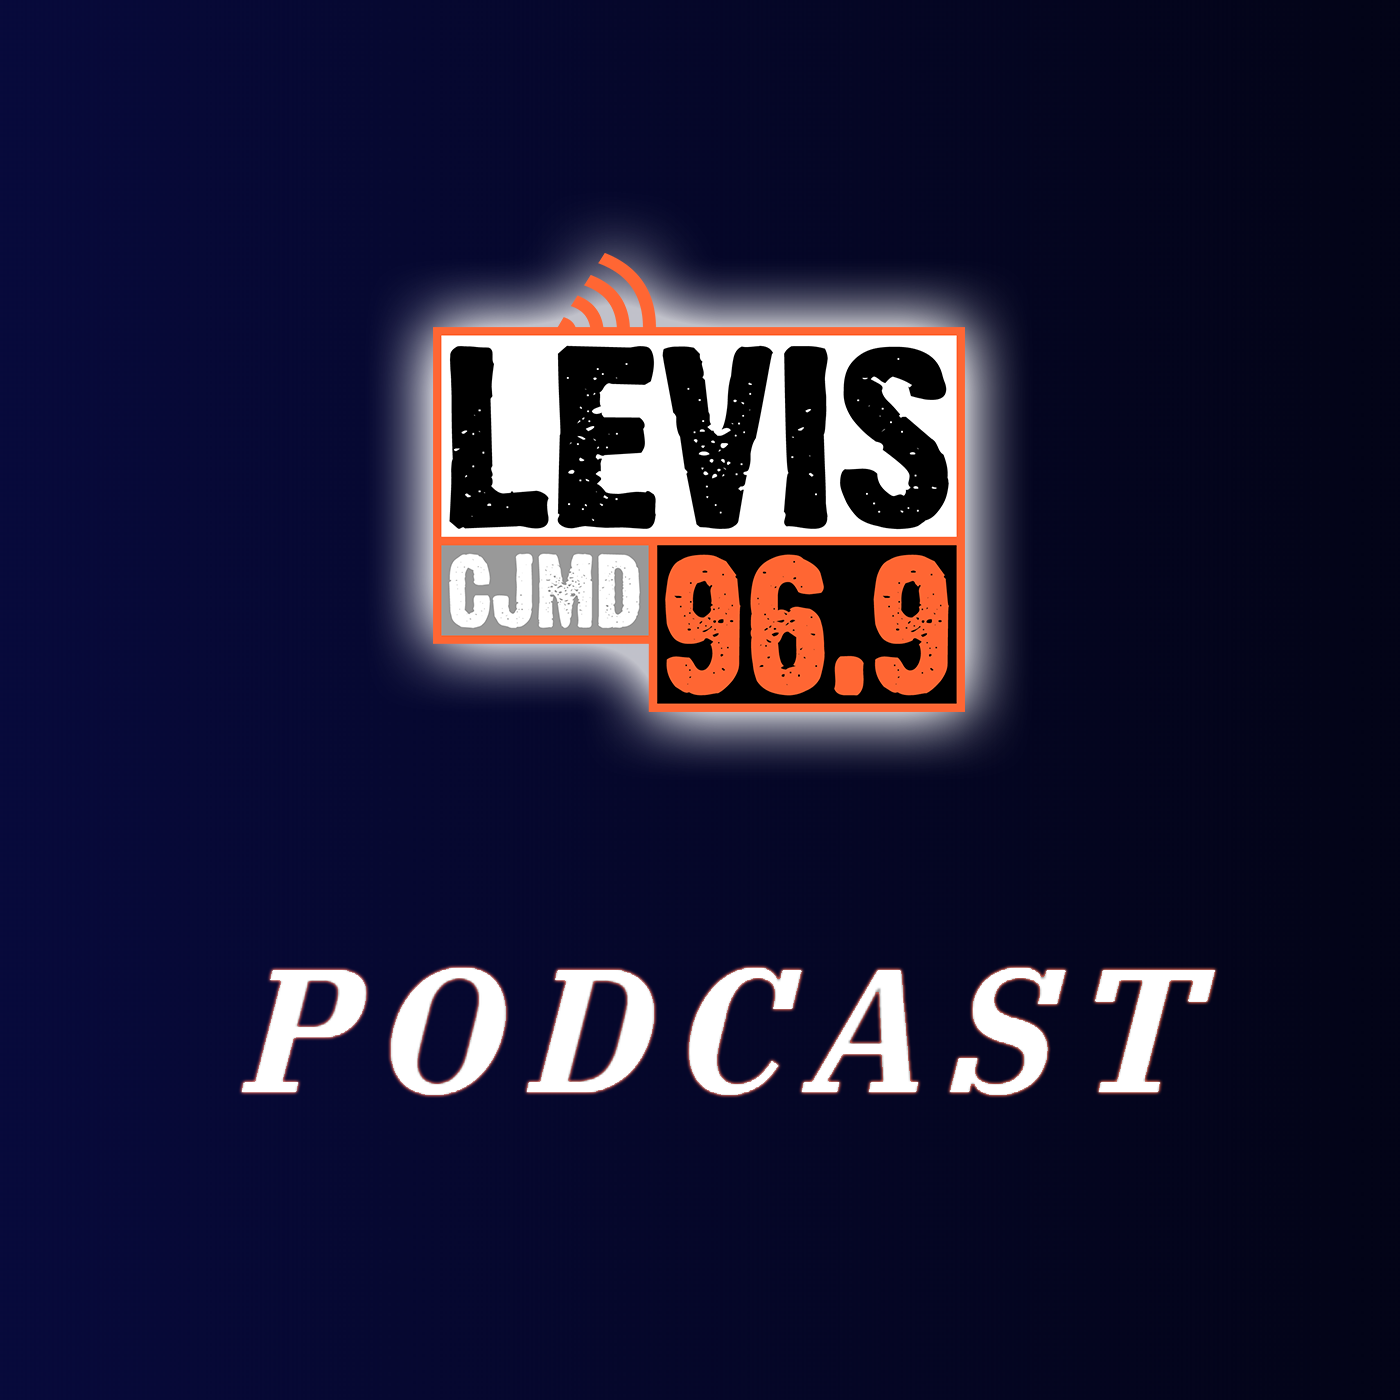 Les Hits du Vendredi | CJMD 96,9 FM LÉVIS | L'ALTERNATIVE RADIOPHONIQUE